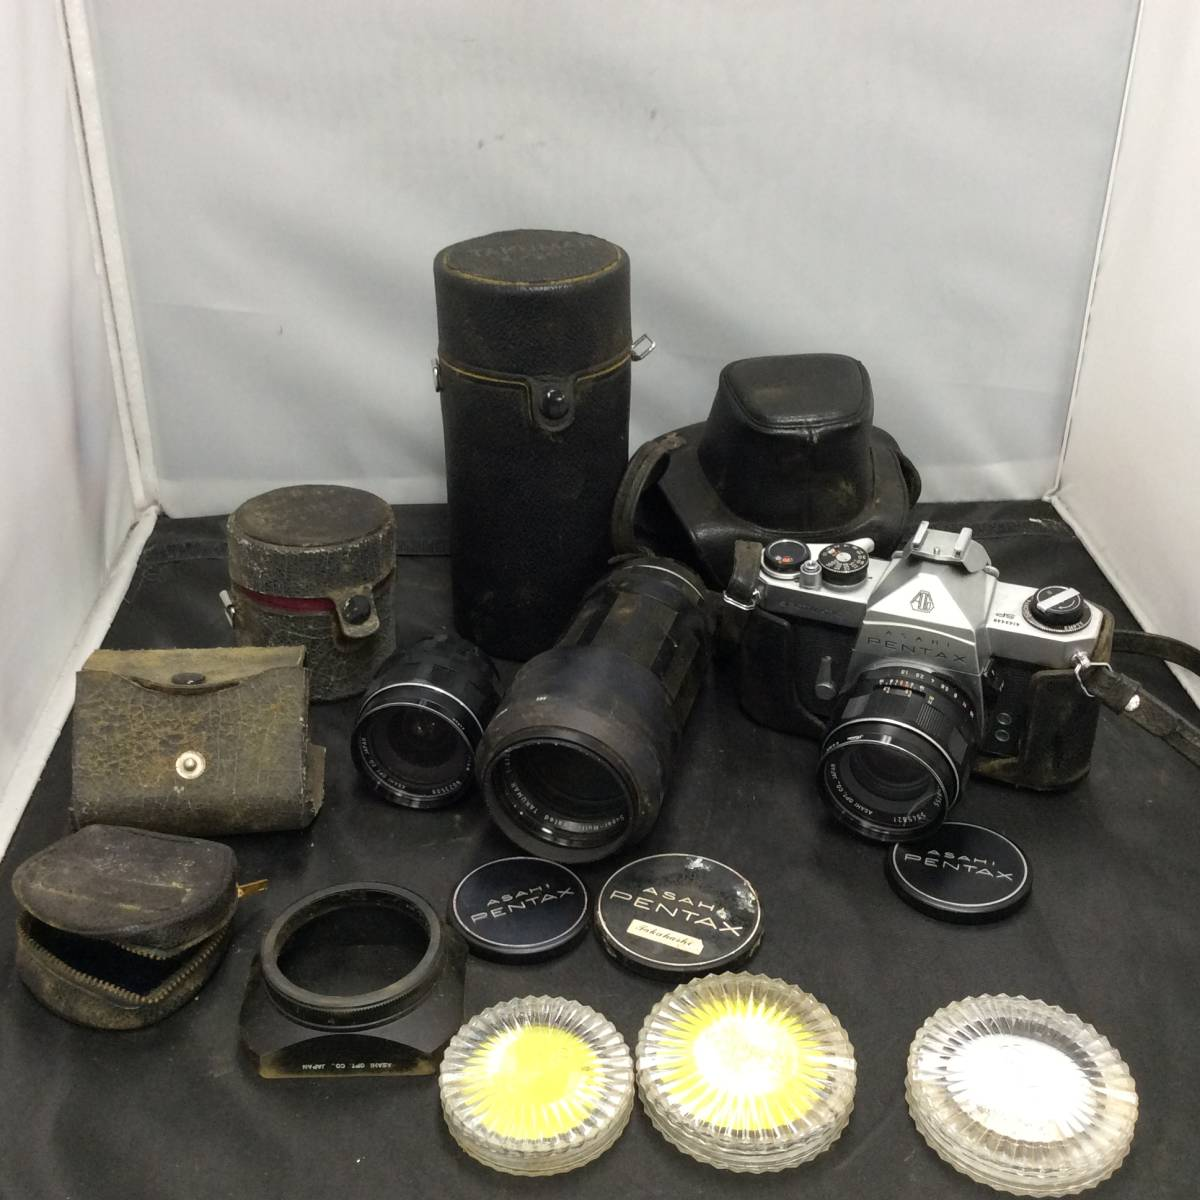 ●○5/14 163883 PENTAX カメラ 本体 Nikon ASAHI レンズ TOSHIBA フラッシュ セット まとめ○●_画像2